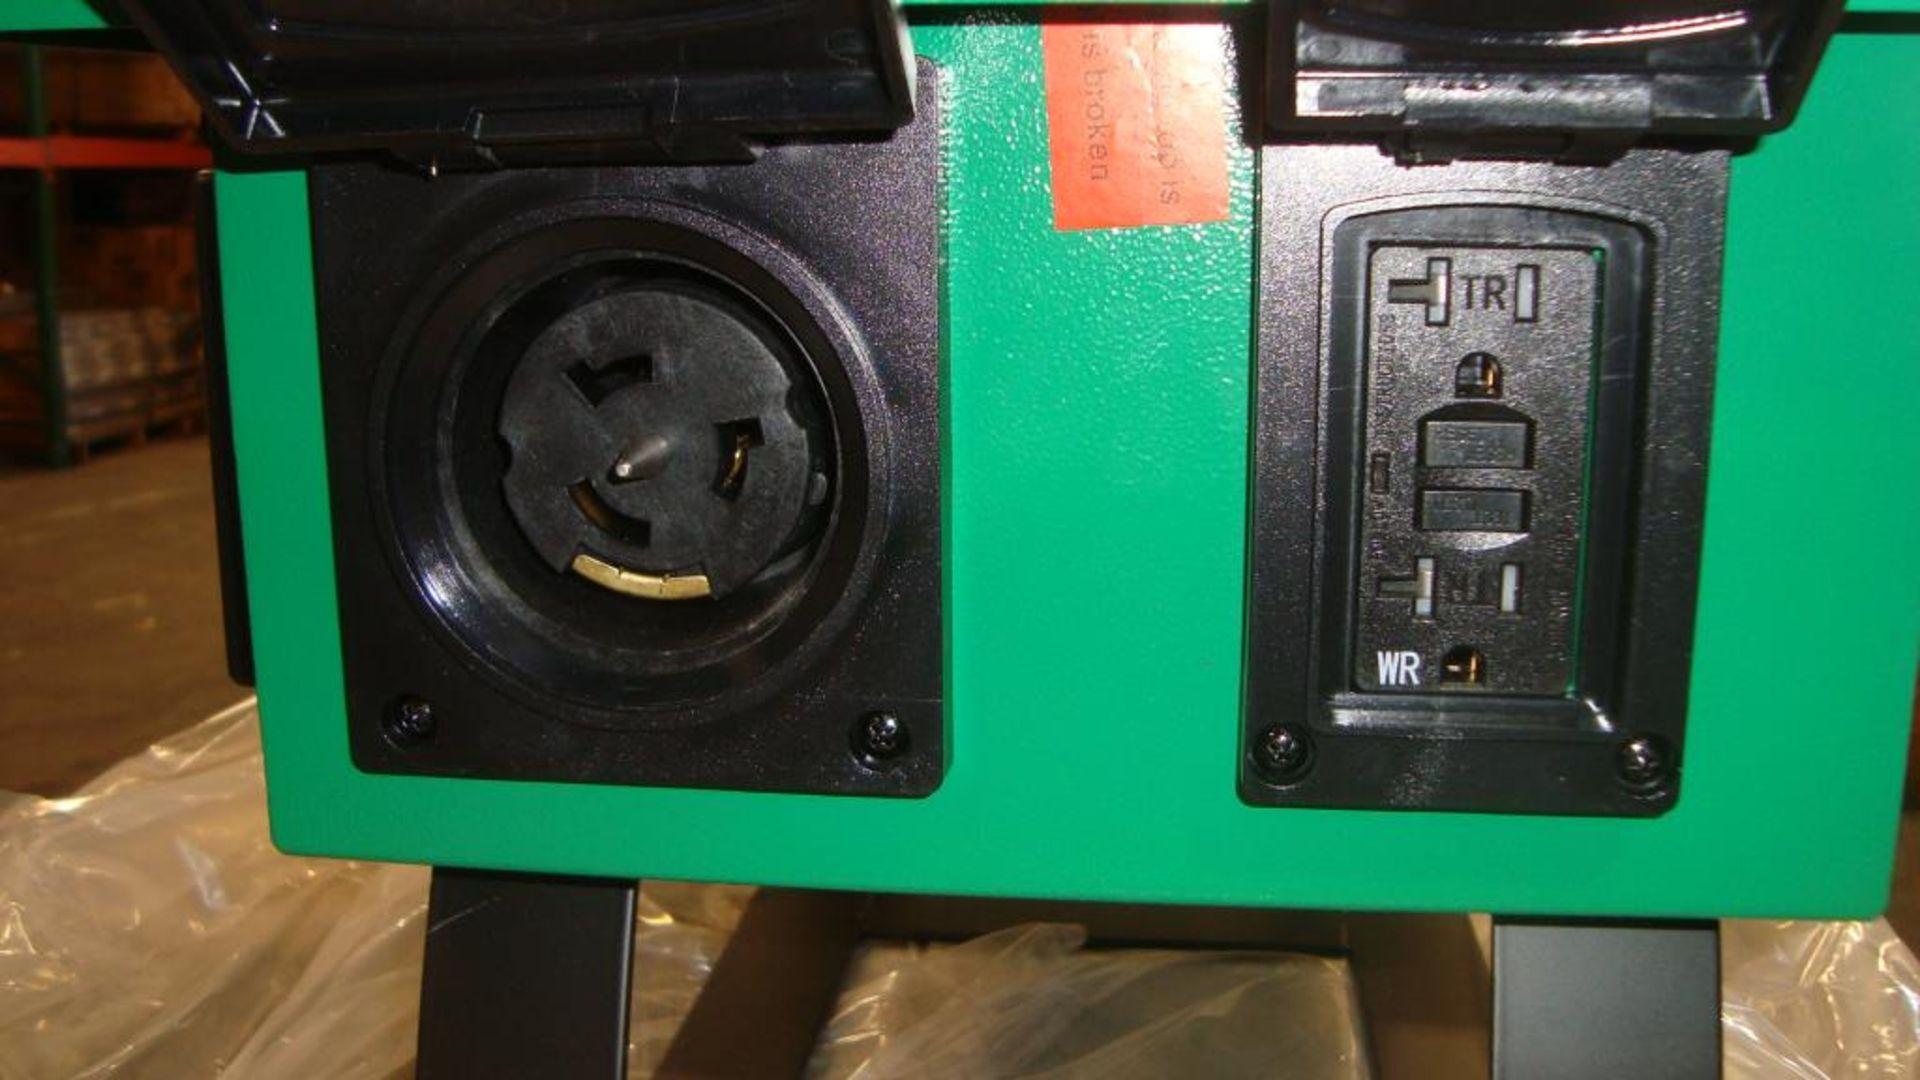 Power Distribution Center. Lot: (1 skid/24 per skid) Power Tech Model D18511000GN Indoor- Outdoor - Image 6 of 13